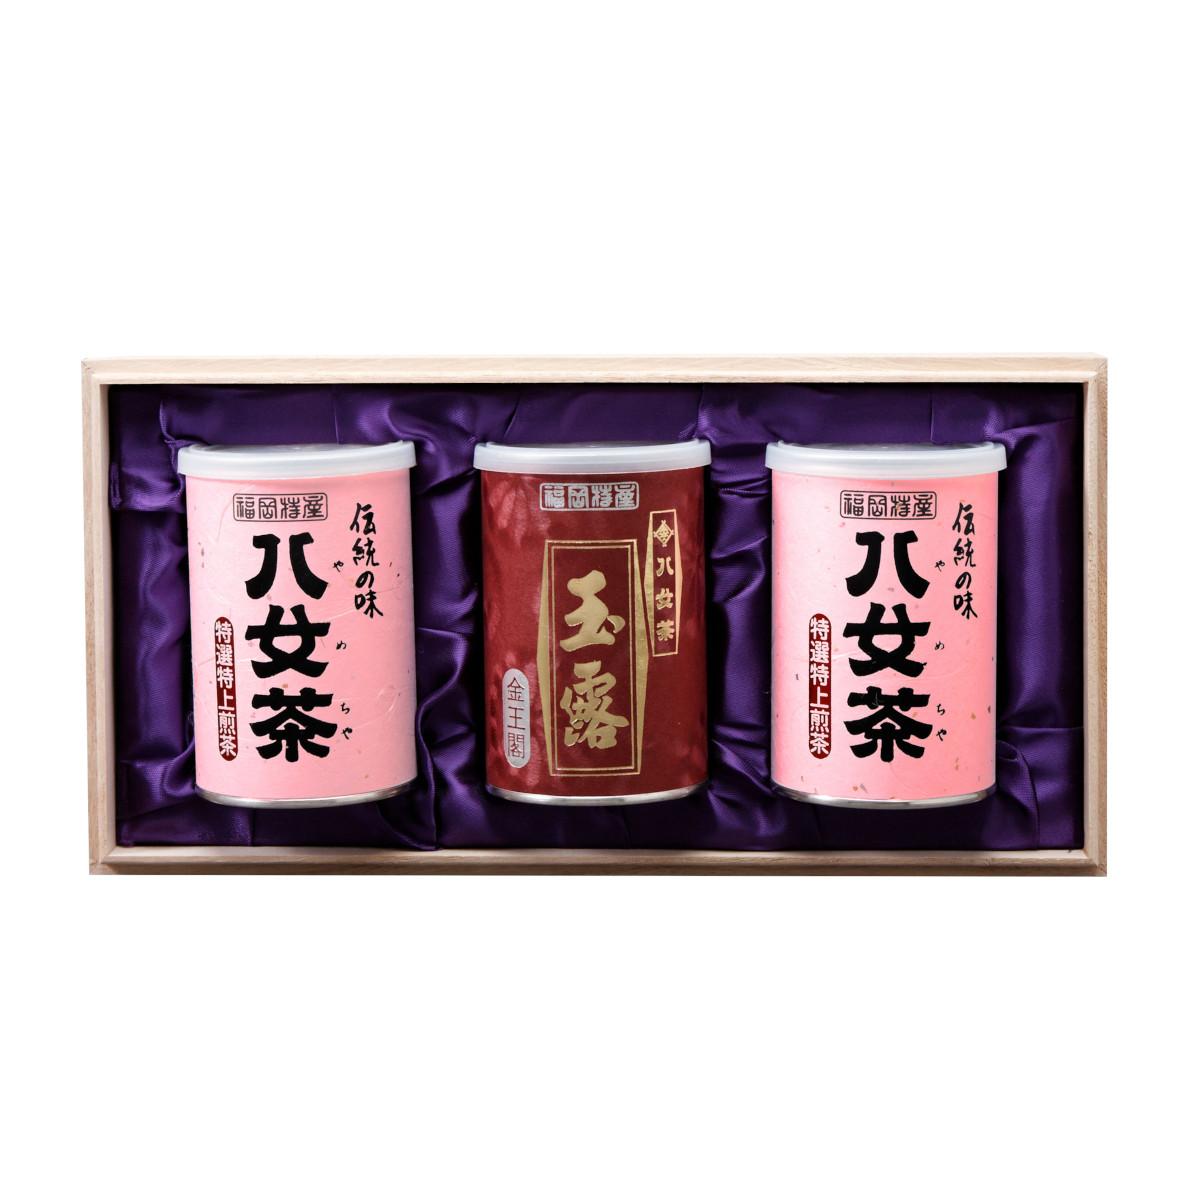 【G-233・サル】特選特上煎茶・玉露金 100g×3缶木箱ギフト